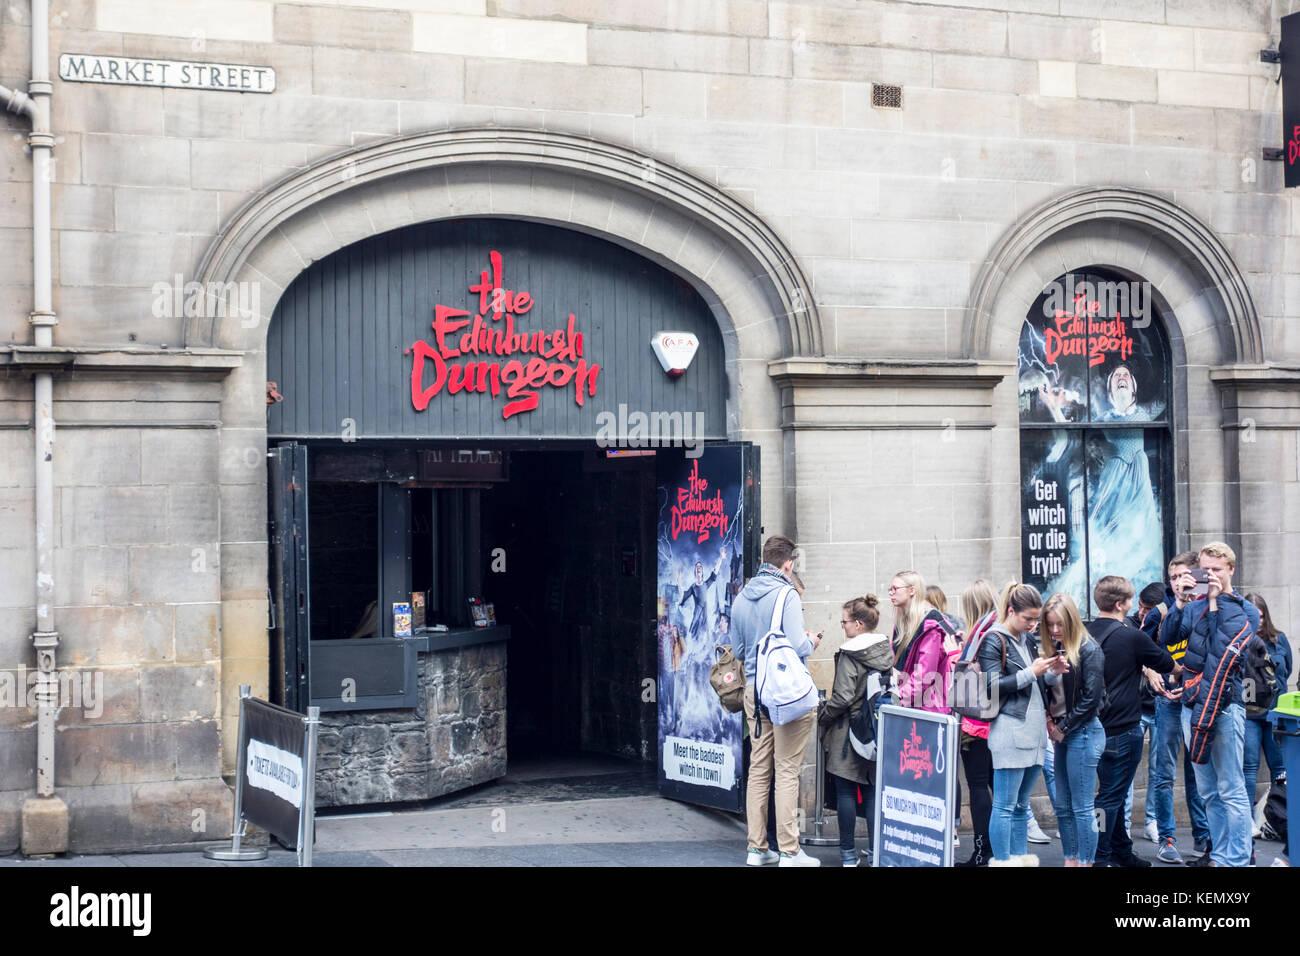 People in a queue outside The Edinburgh Dungeon, Market Street, Edinburgh, Scotland, UK - Stock Image